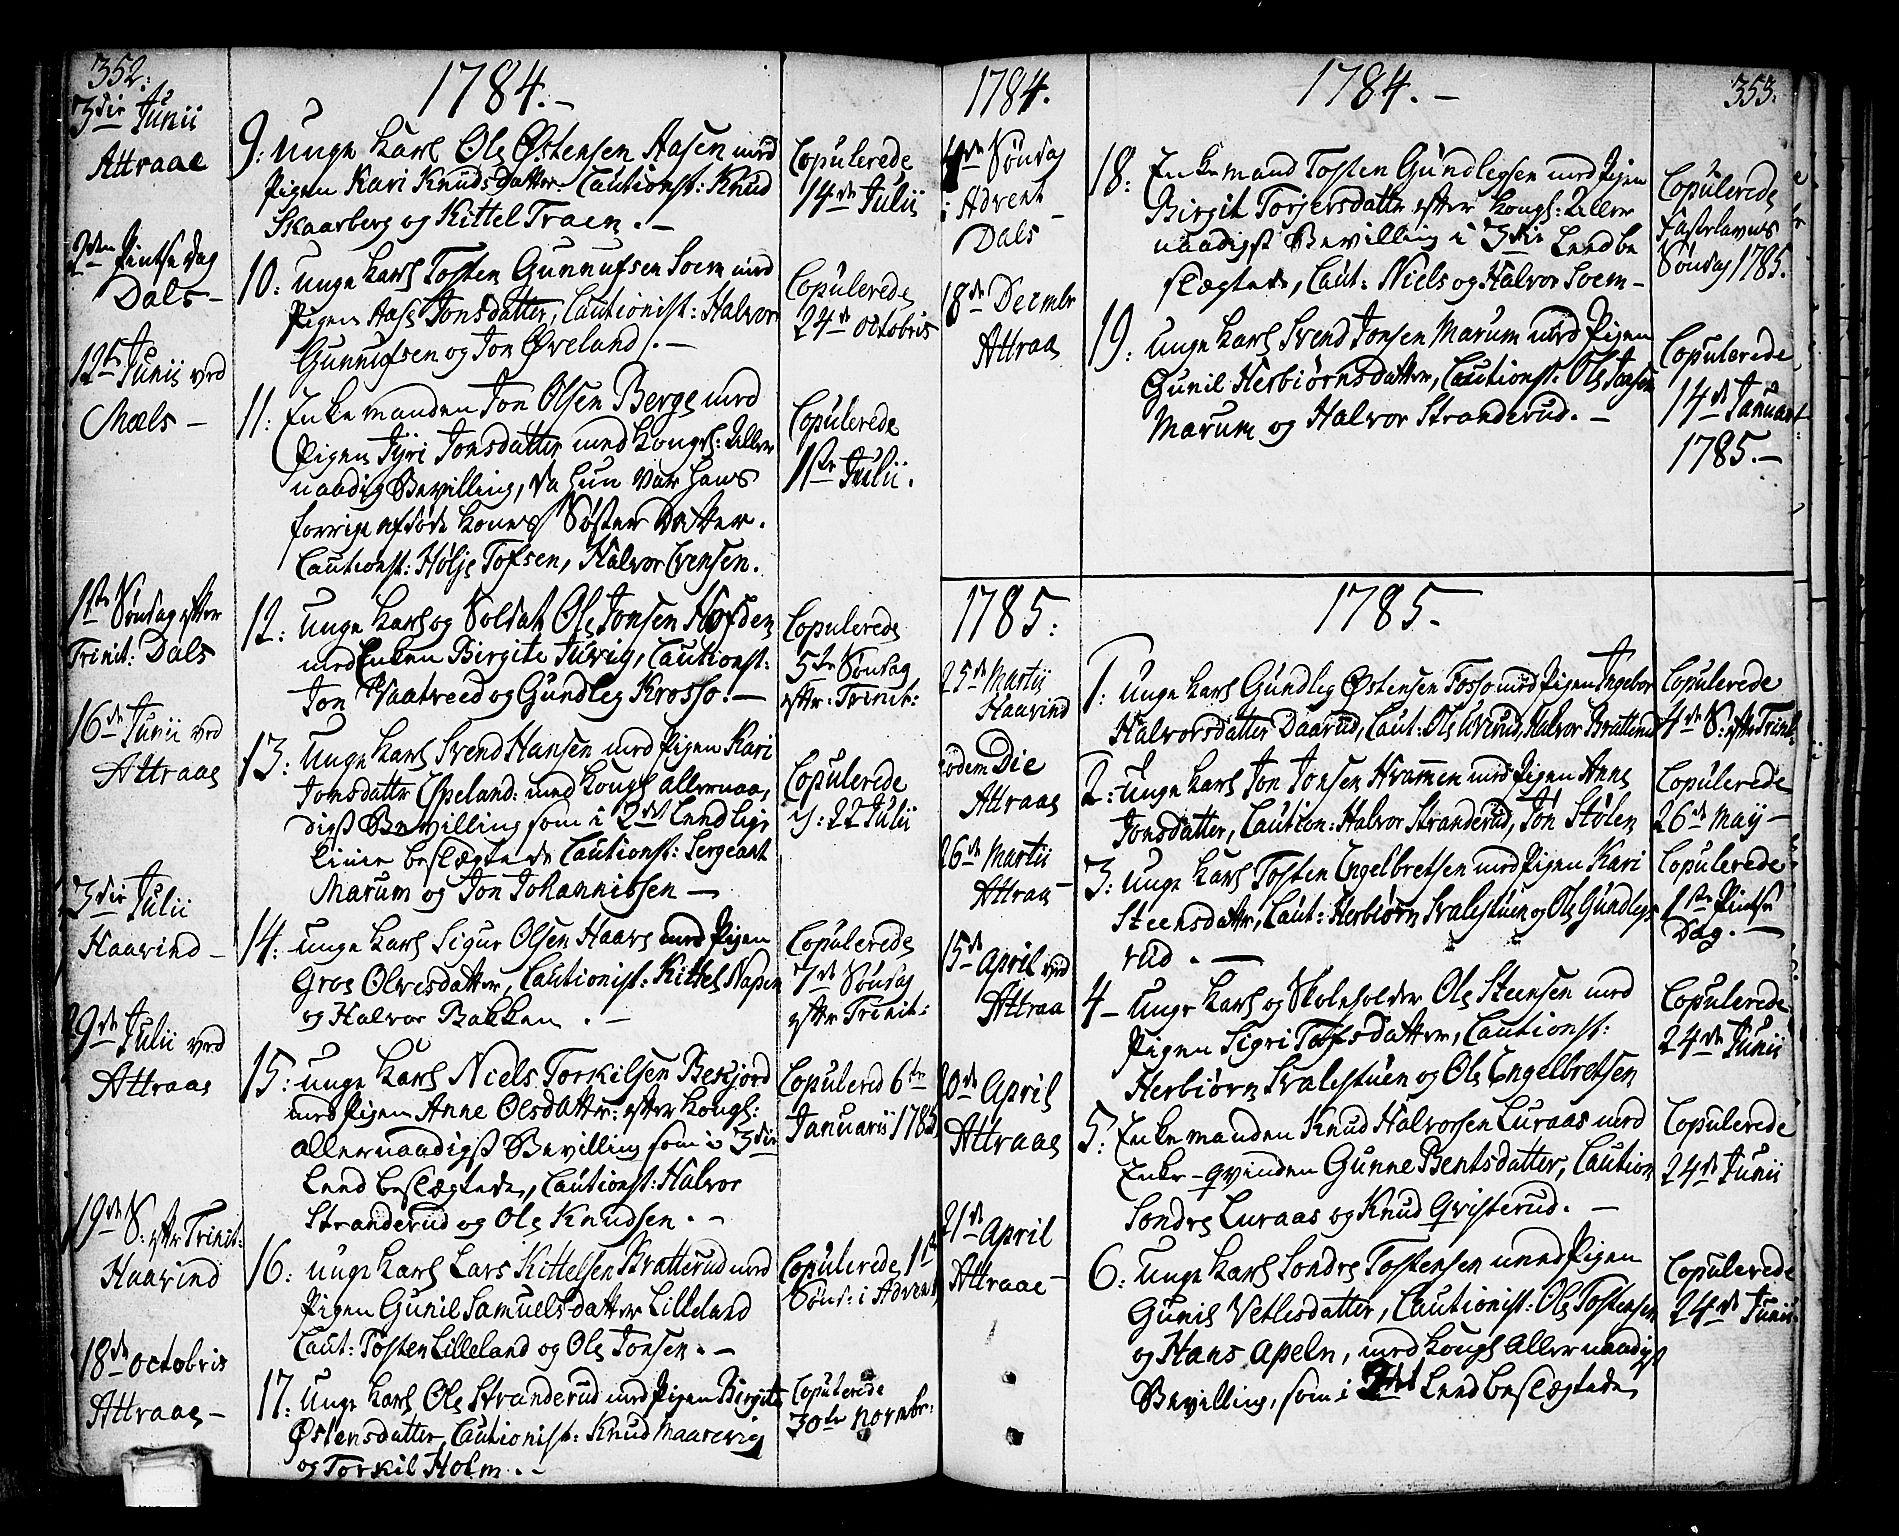 SAKO, Tinn kirkebøker, F/Fa/L0002: Ministerialbok nr. I 2, 1757-1810, s. 352-353